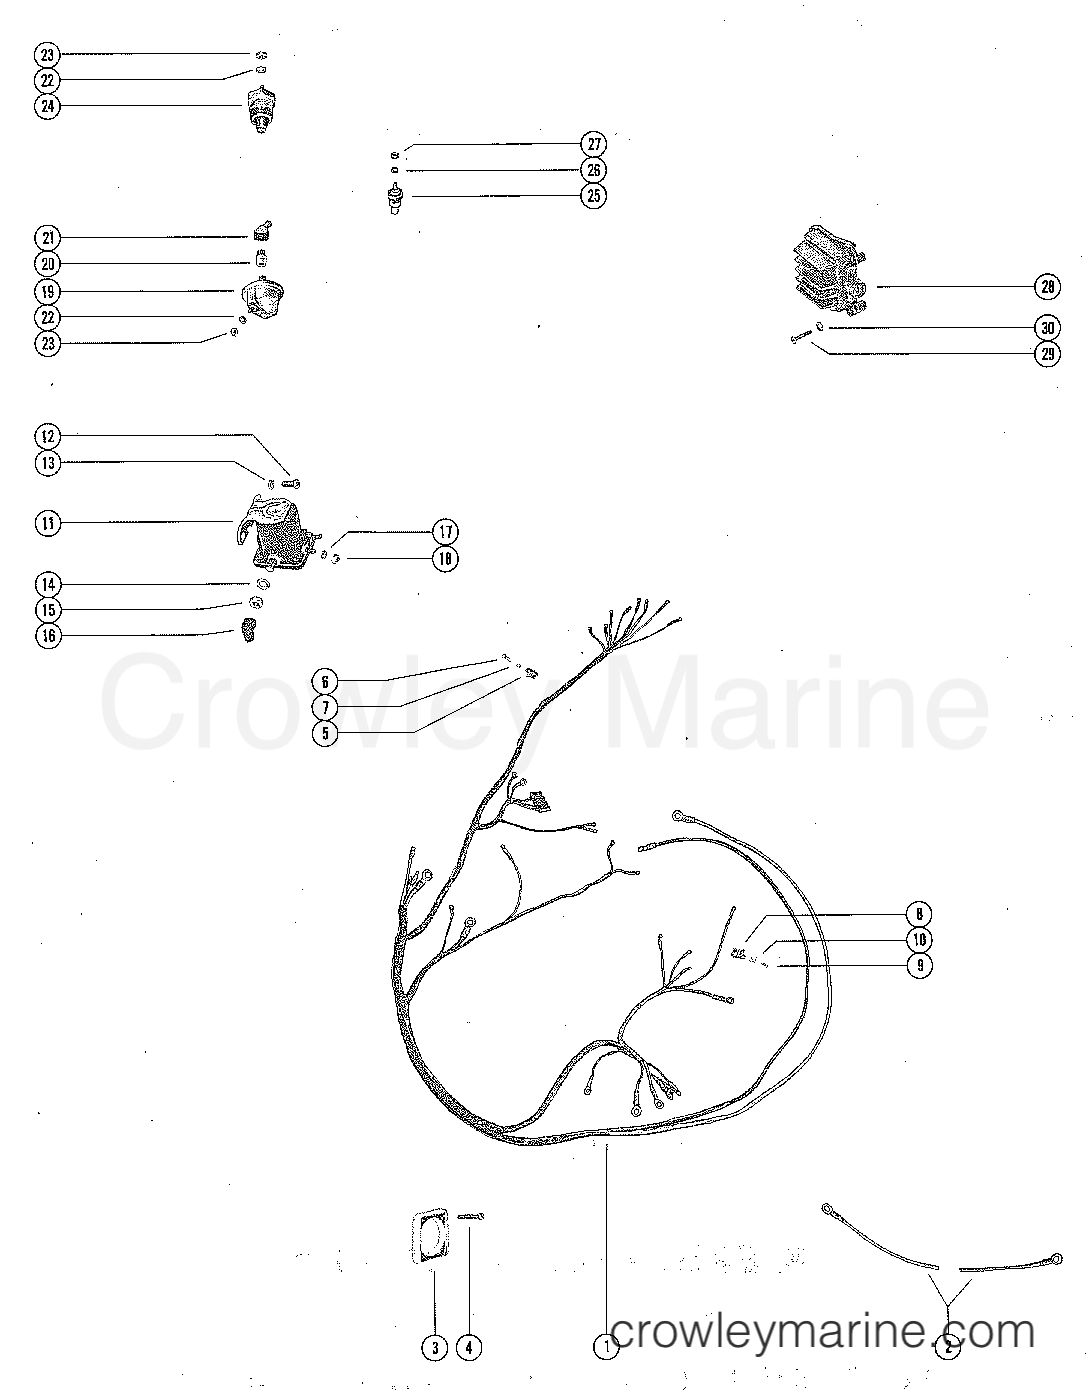 Wiring harness voltage regulator and starter solenoid serial rh crowleymarine